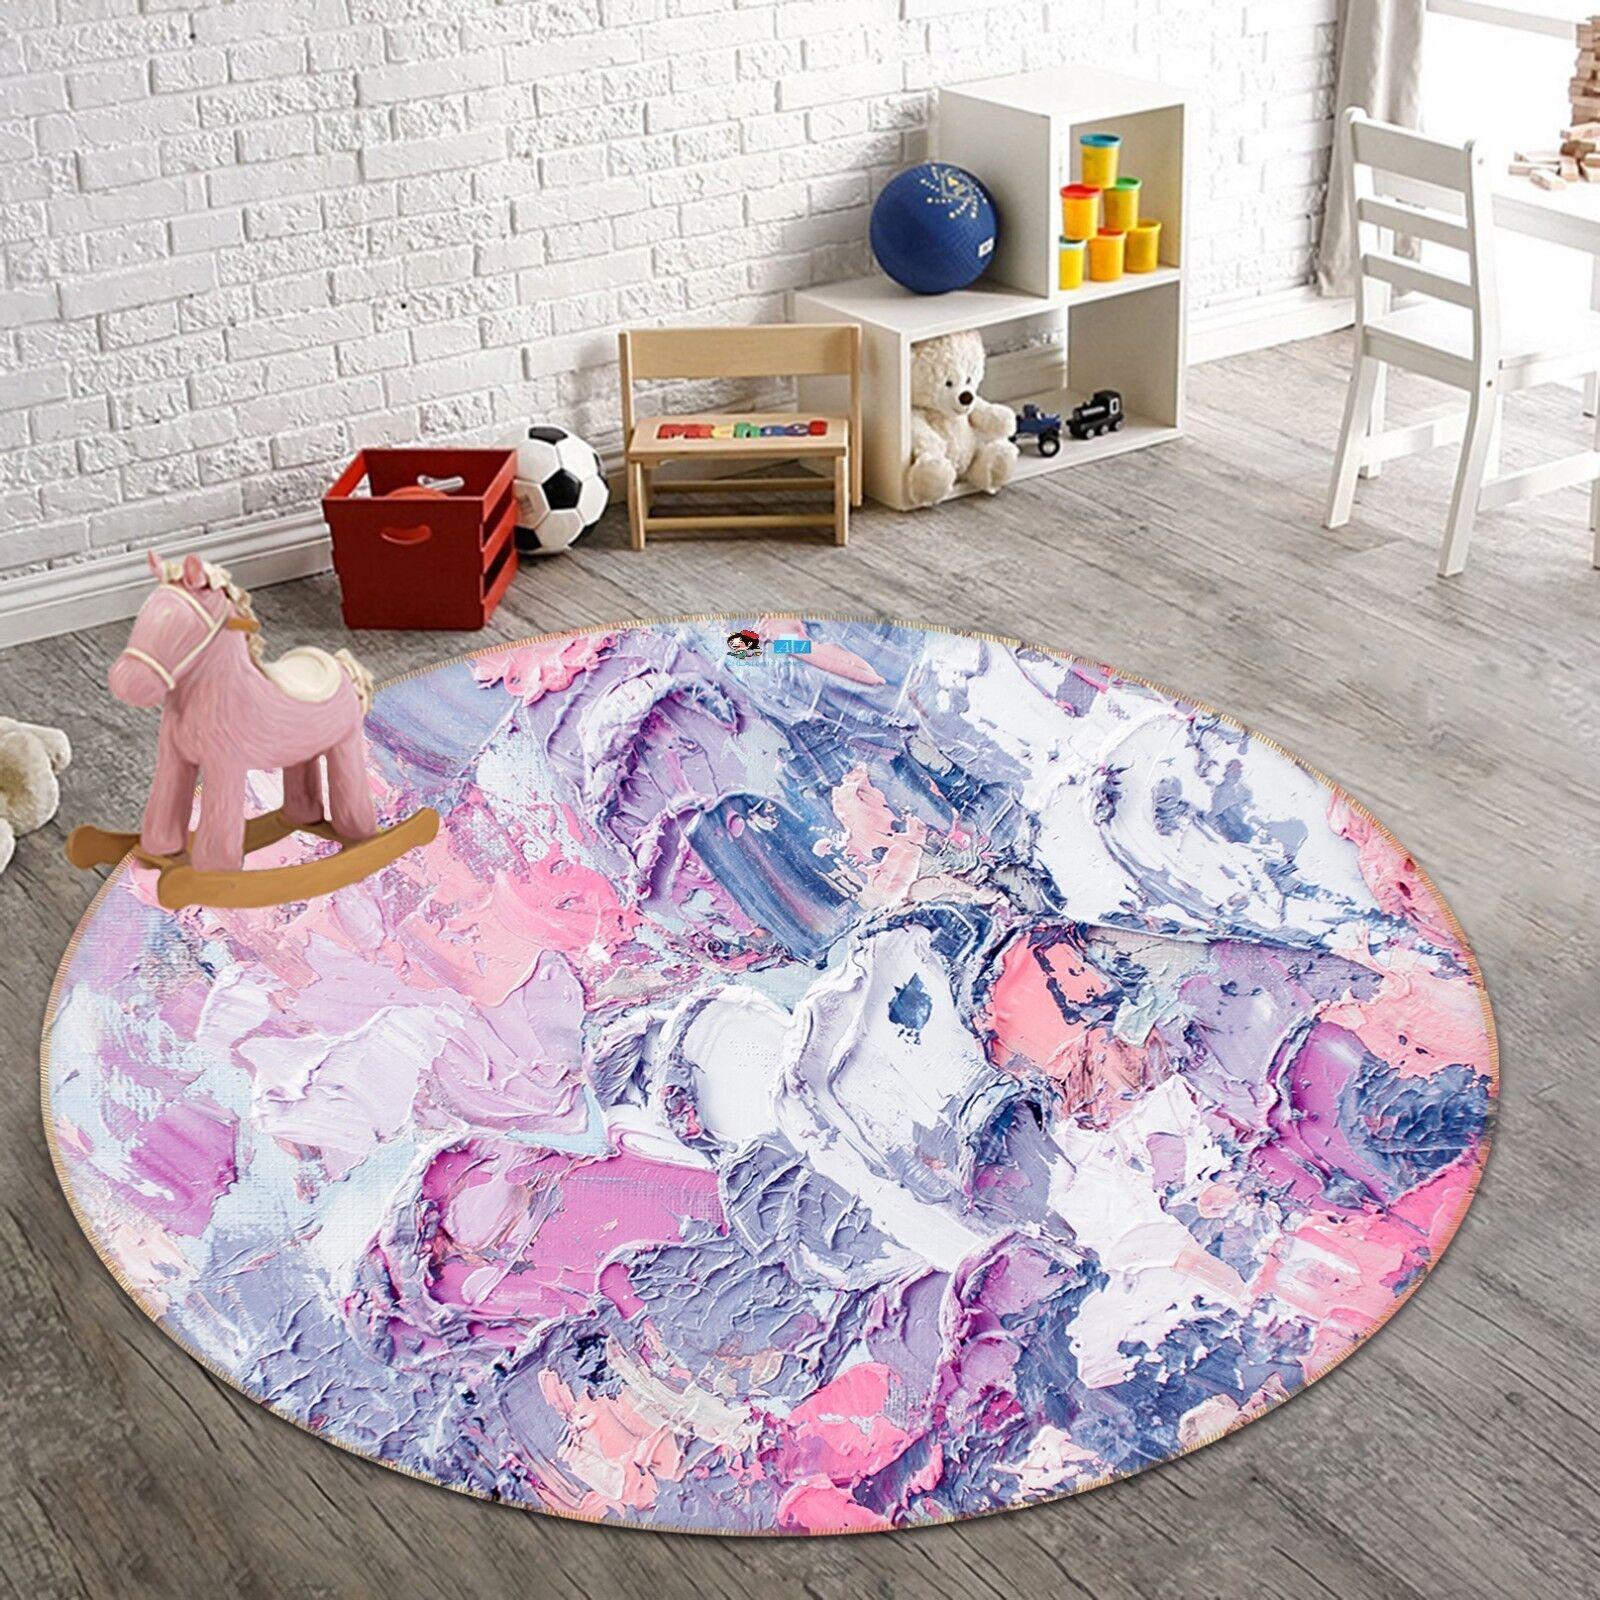 3d gouache revestimiento 4 antideslizante alfombra maletero rondas elegante alfombra